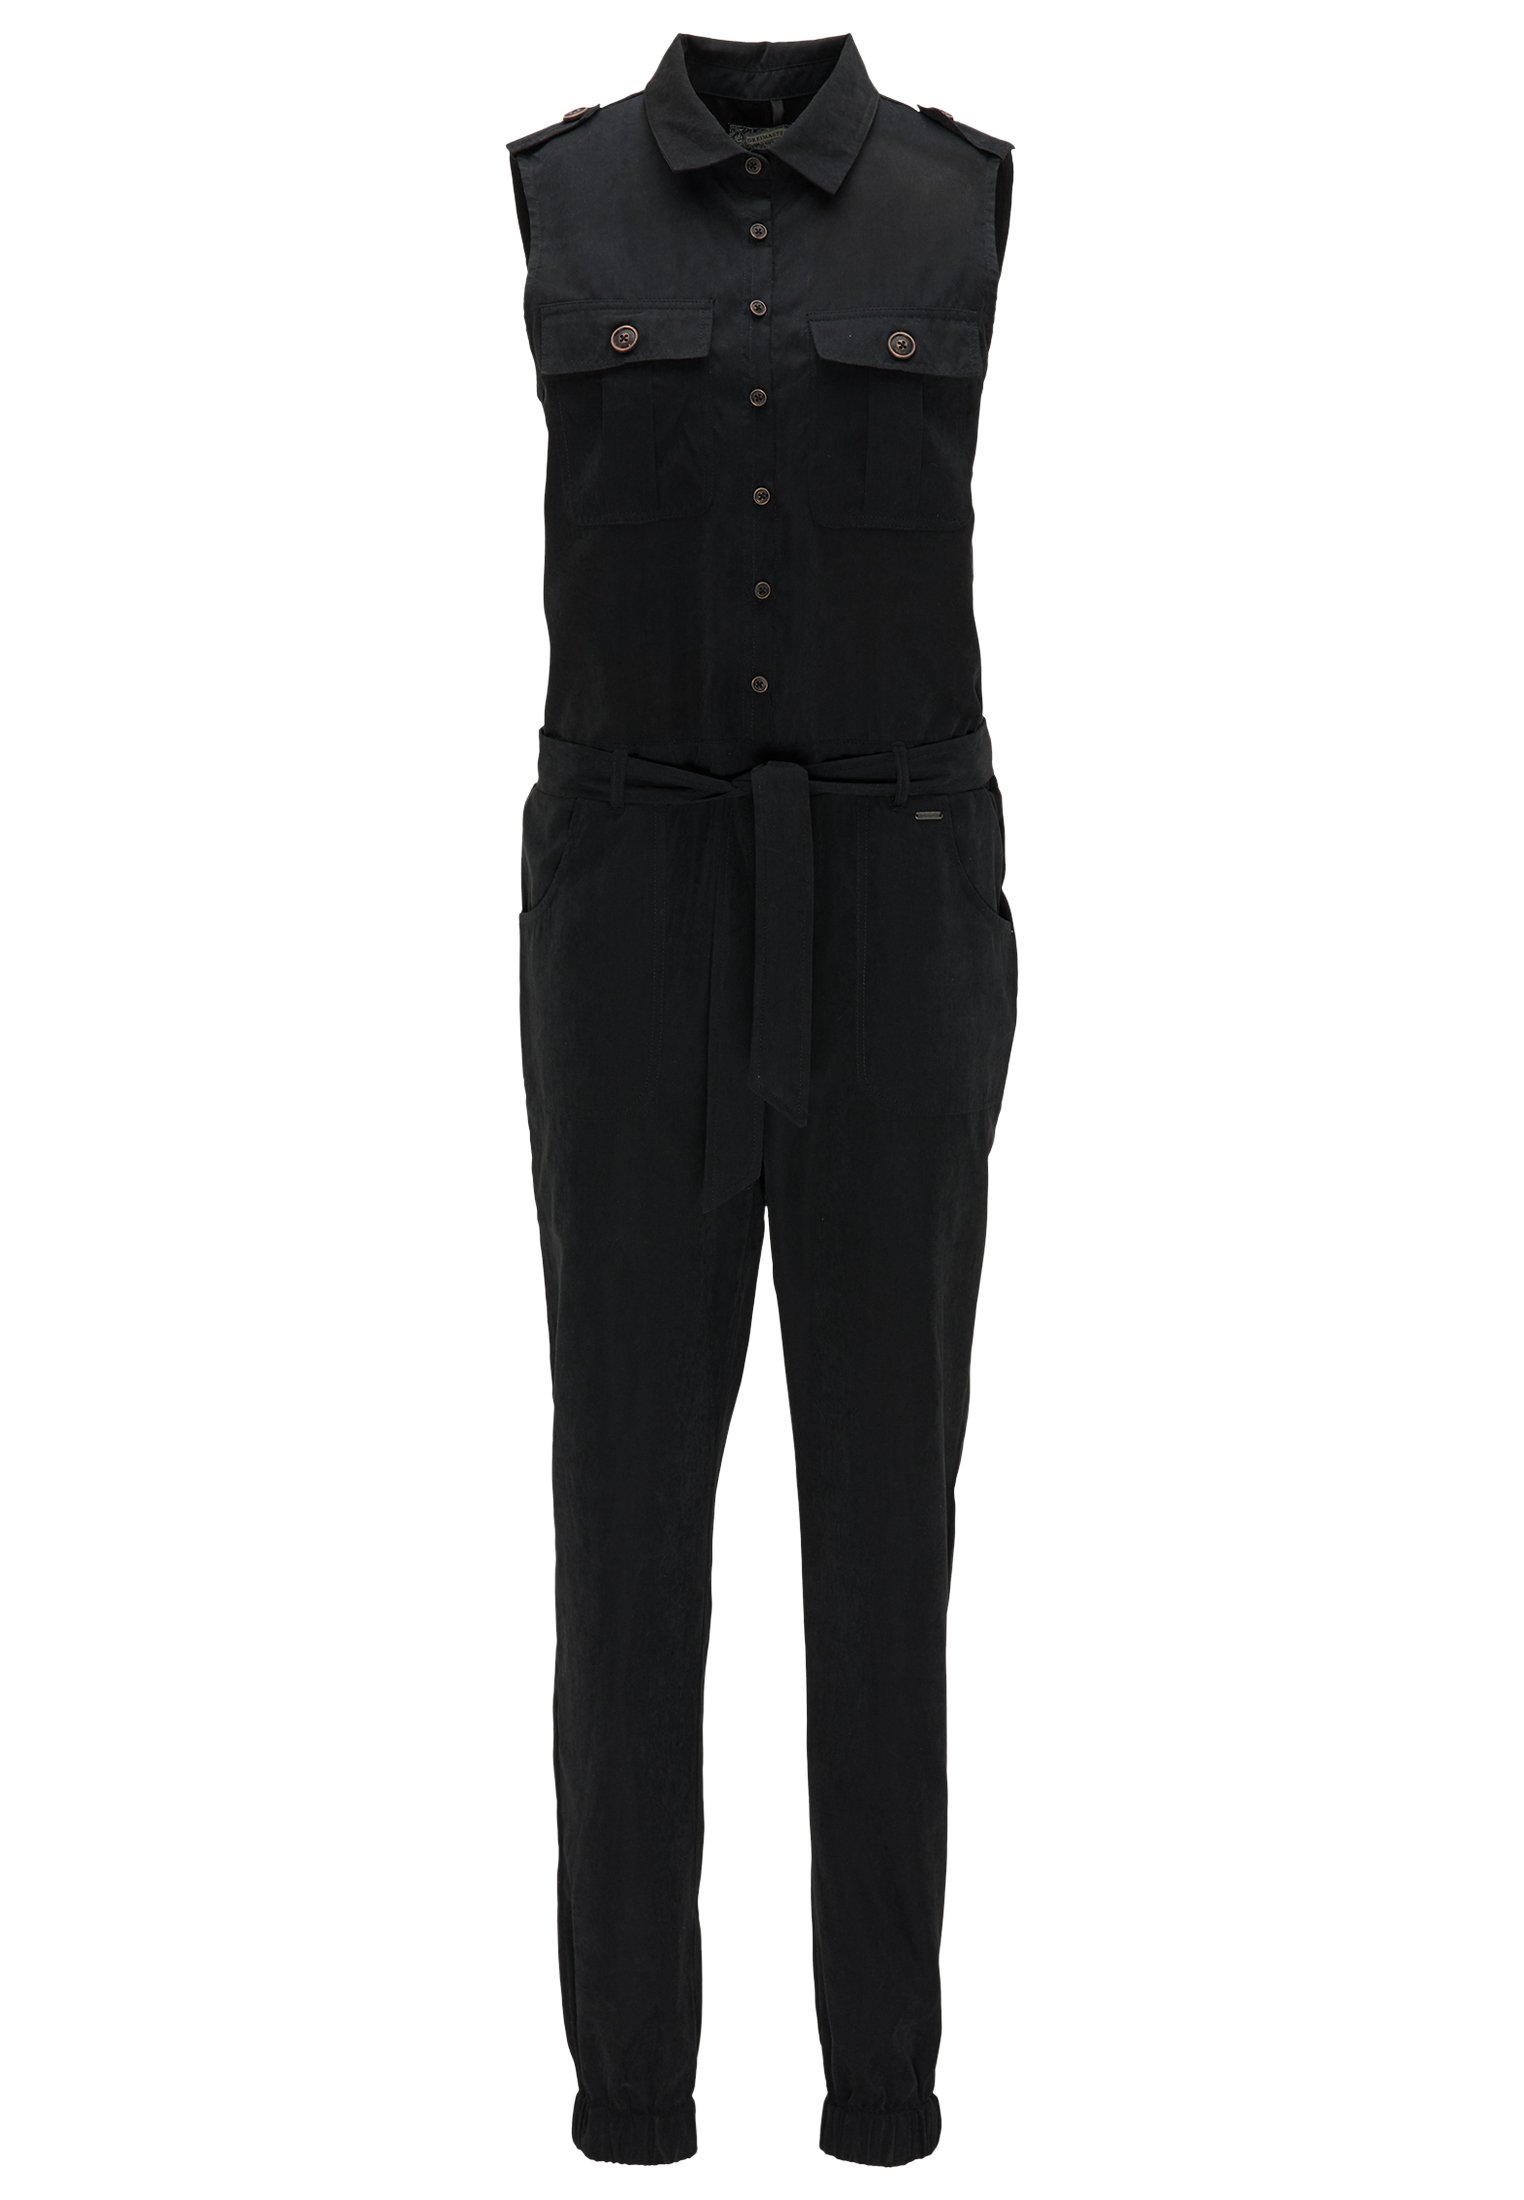 Dreimaster Jumpsuit - Black